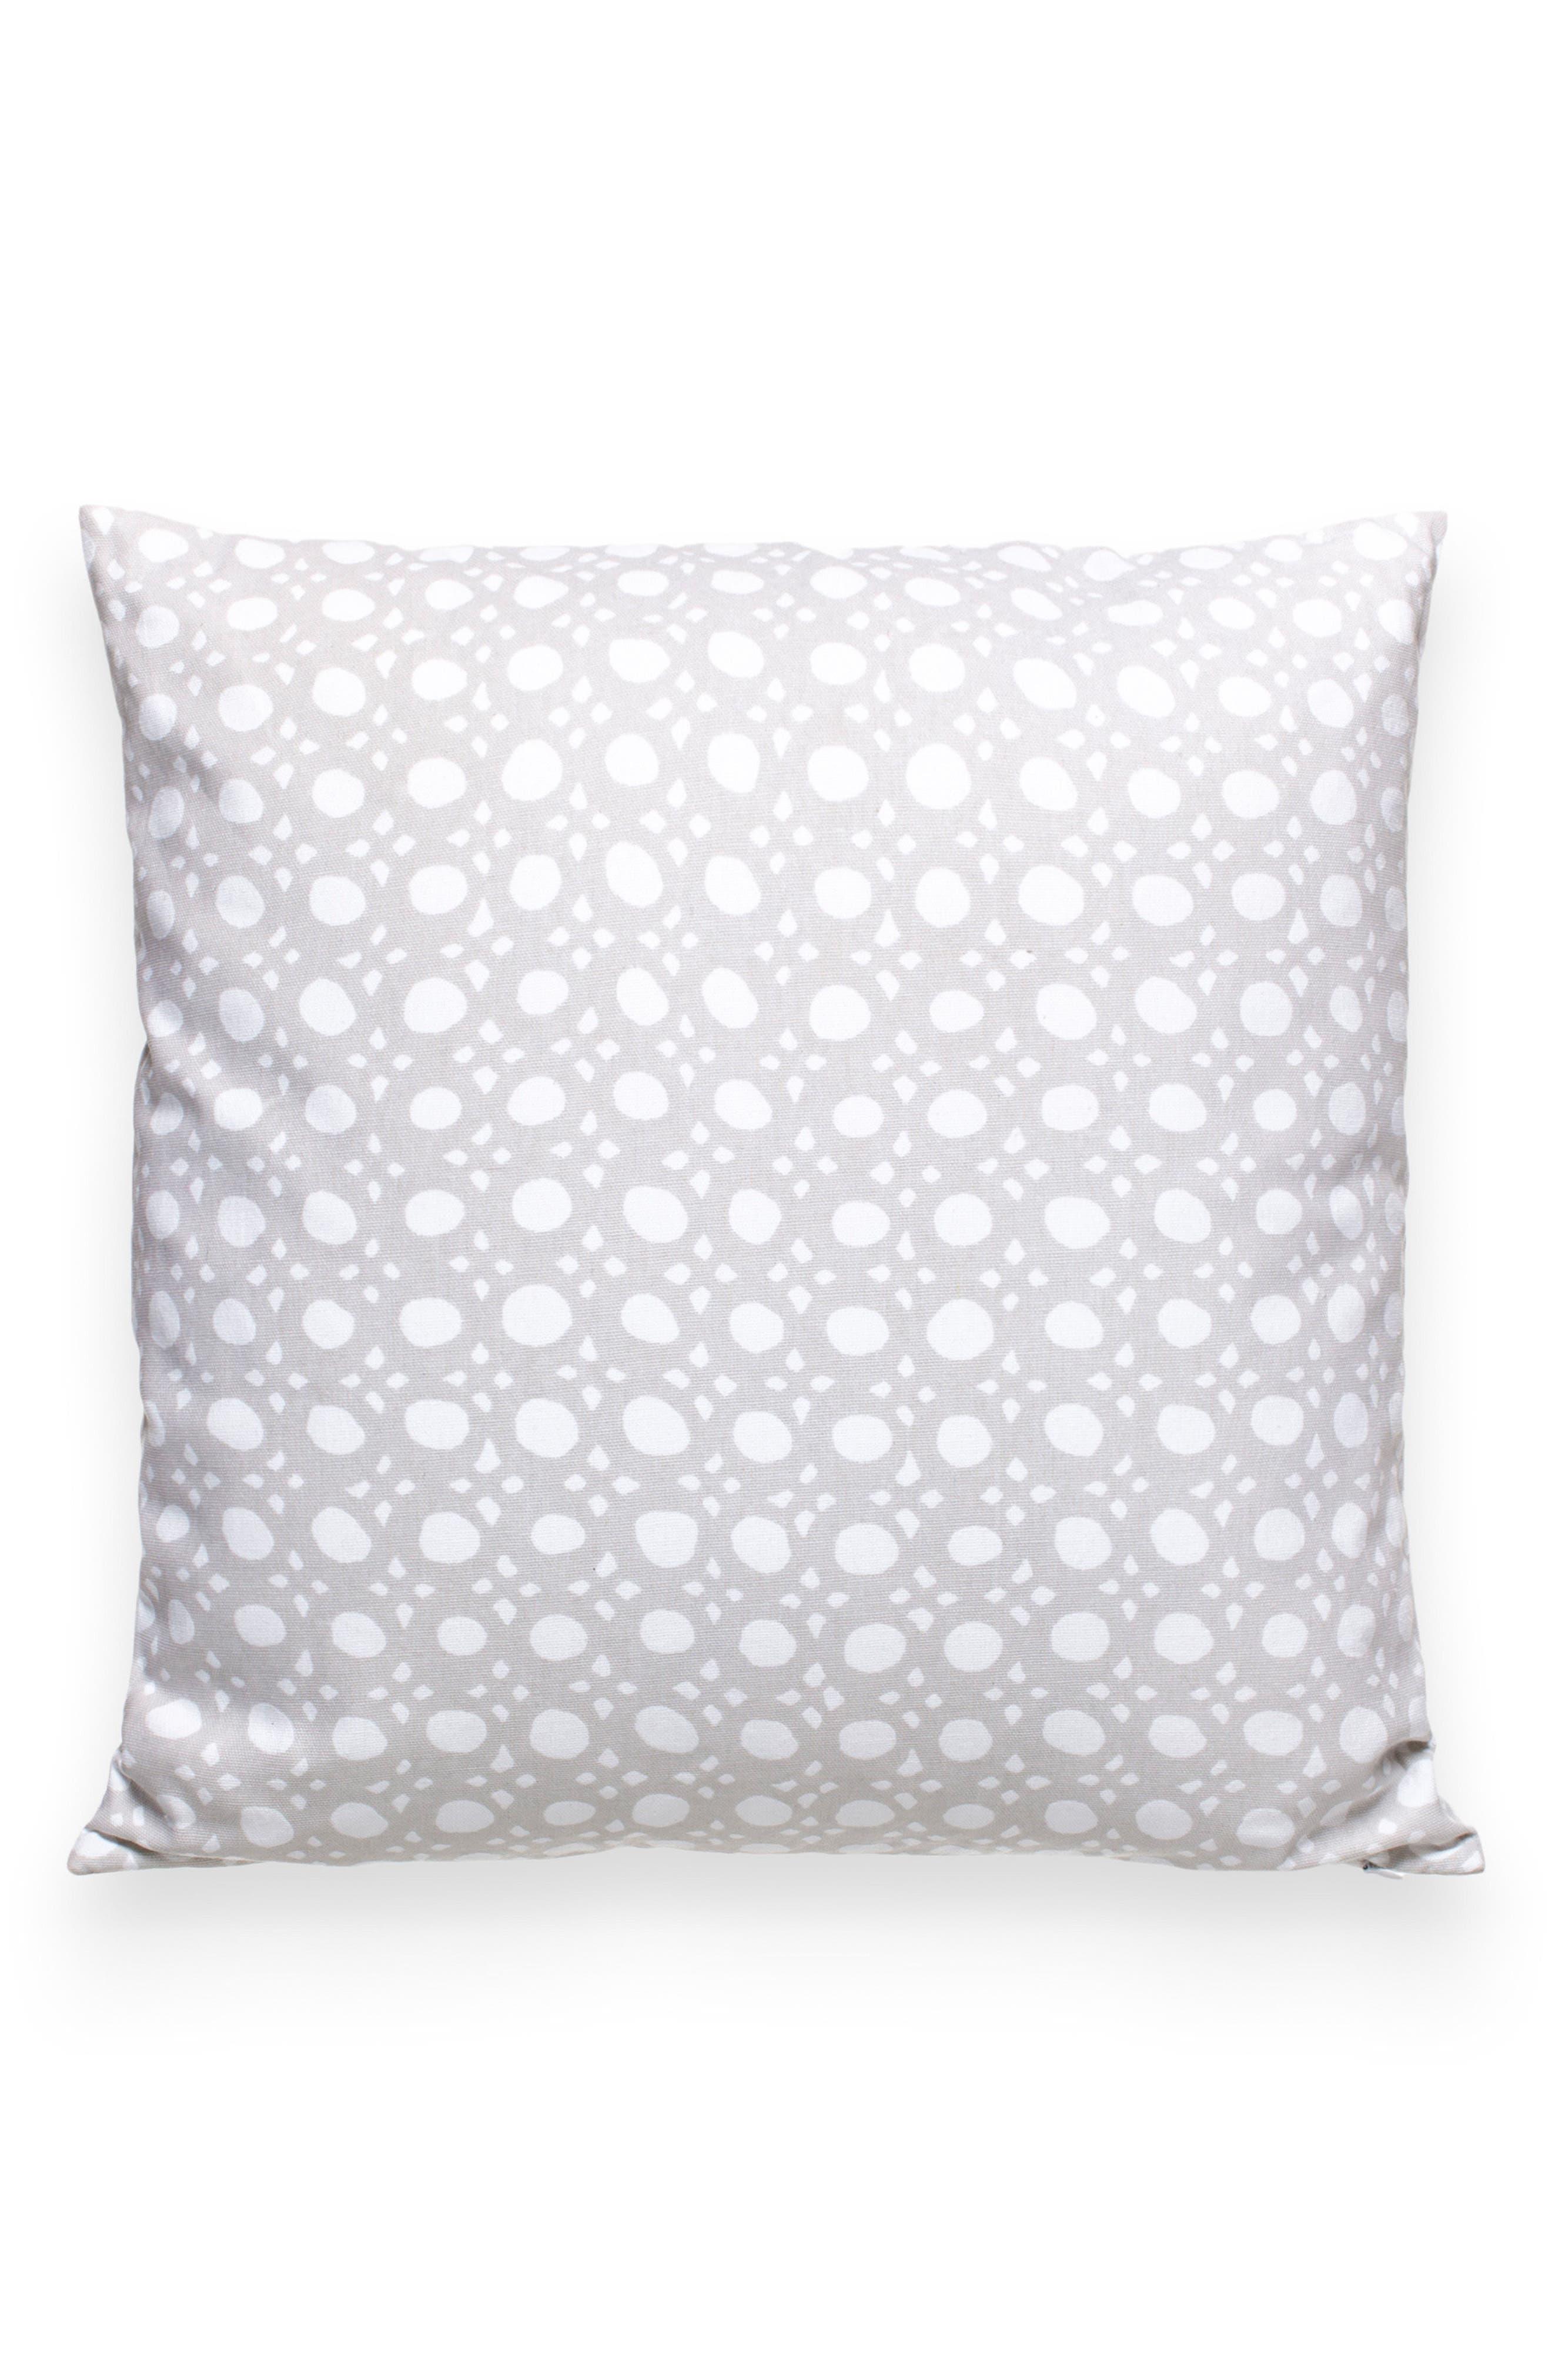 caning pillow,                             Main thumbnail 1, color,                             020